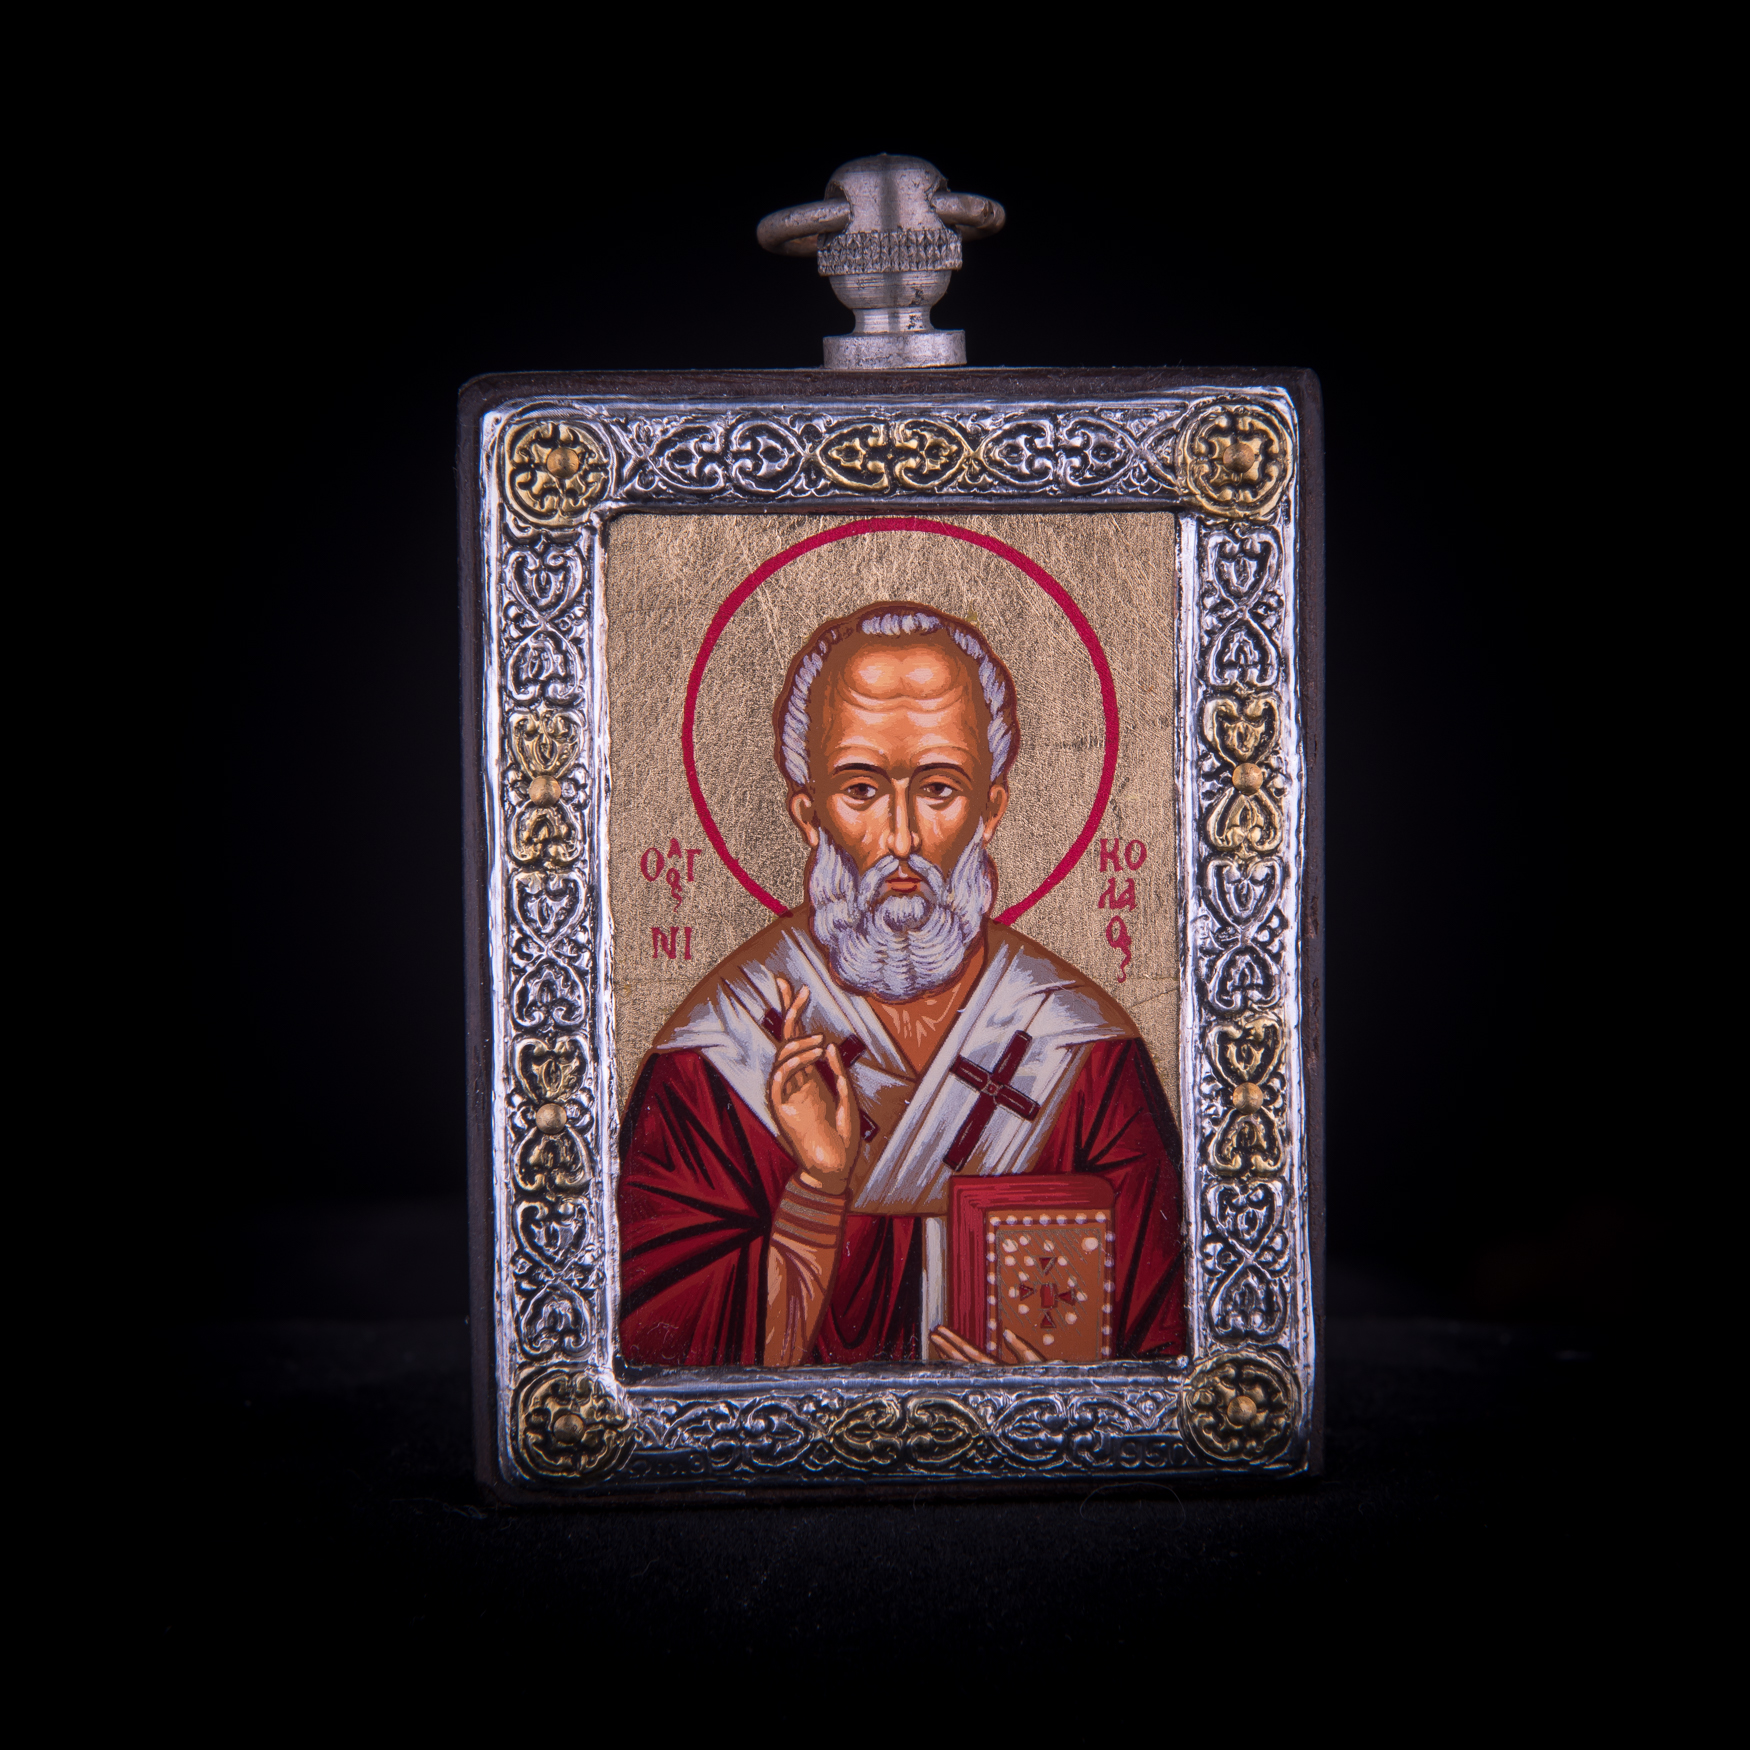 002/0049 Silver icon of Saint Nicolas